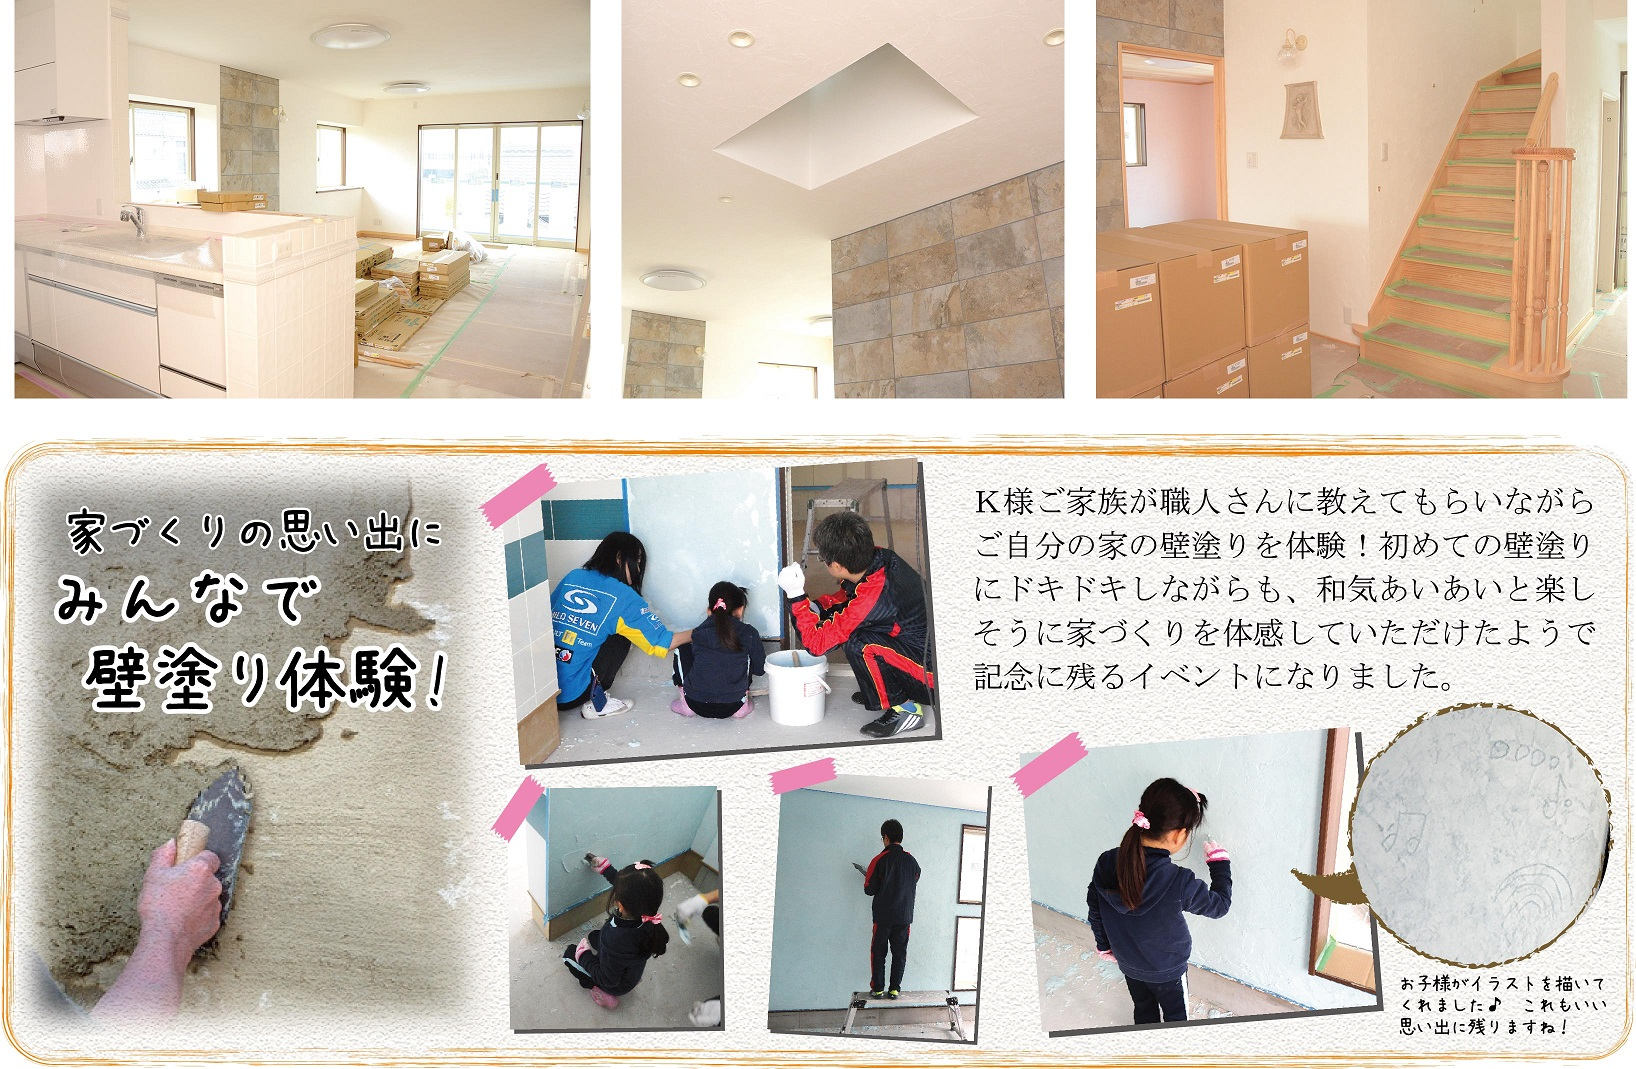 KuraSi-natu-sin90-03.jpg